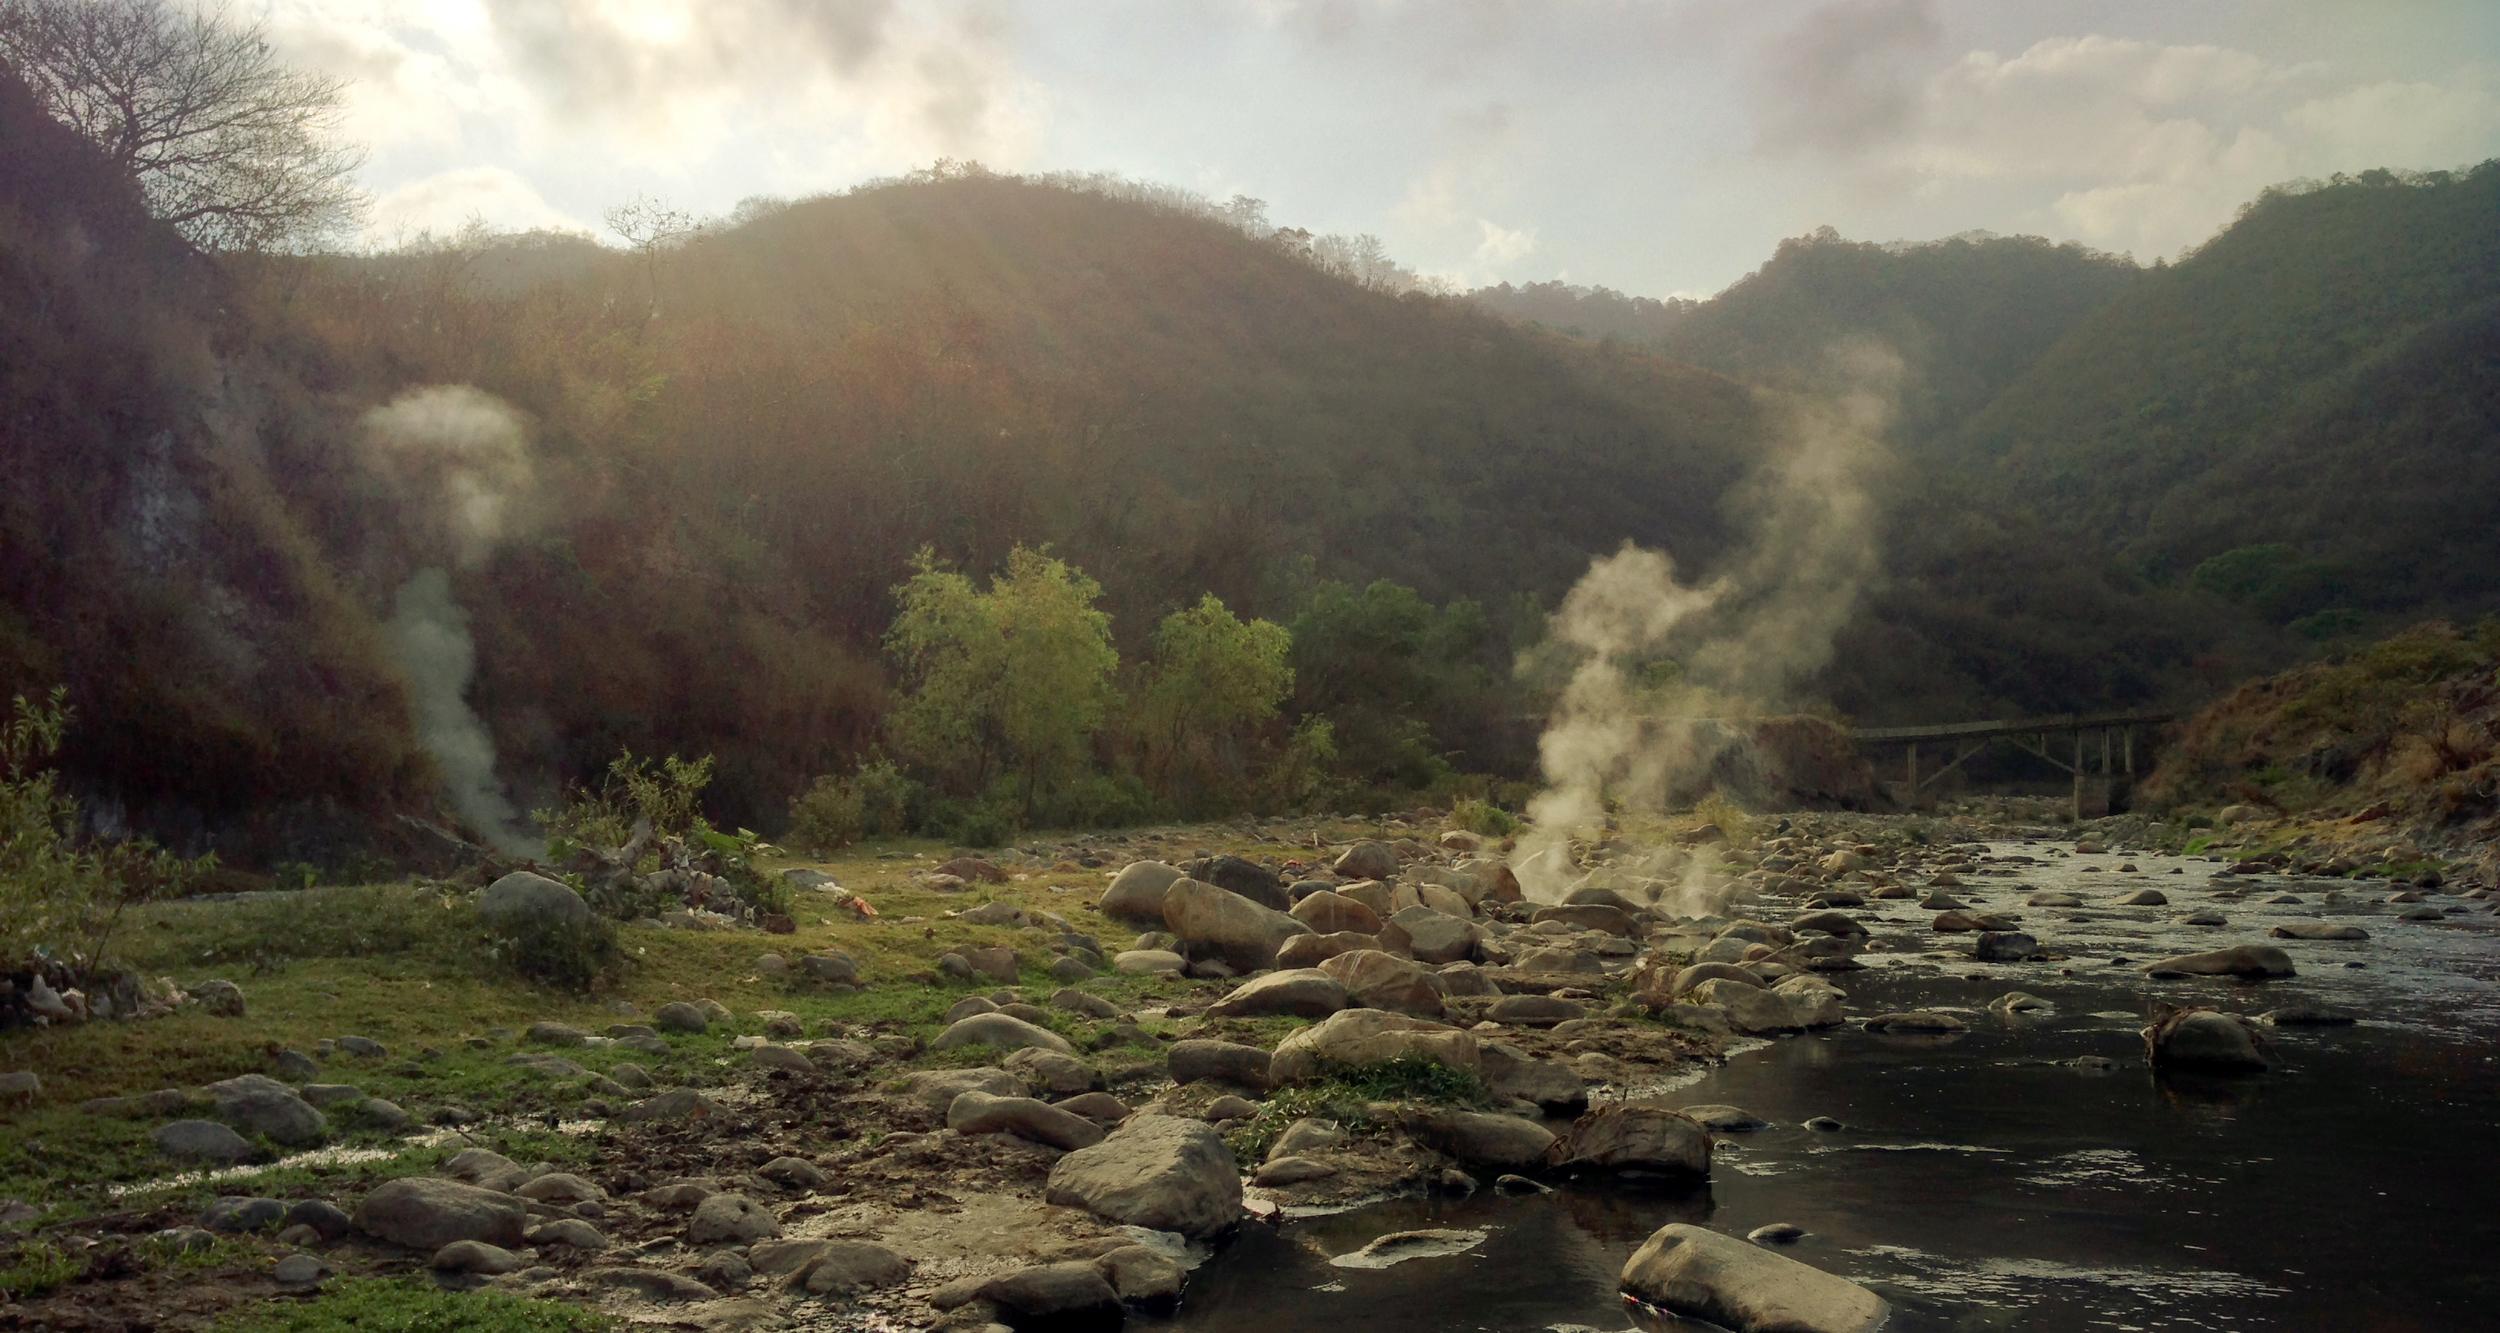 rio las canas with hotsprings.jpg